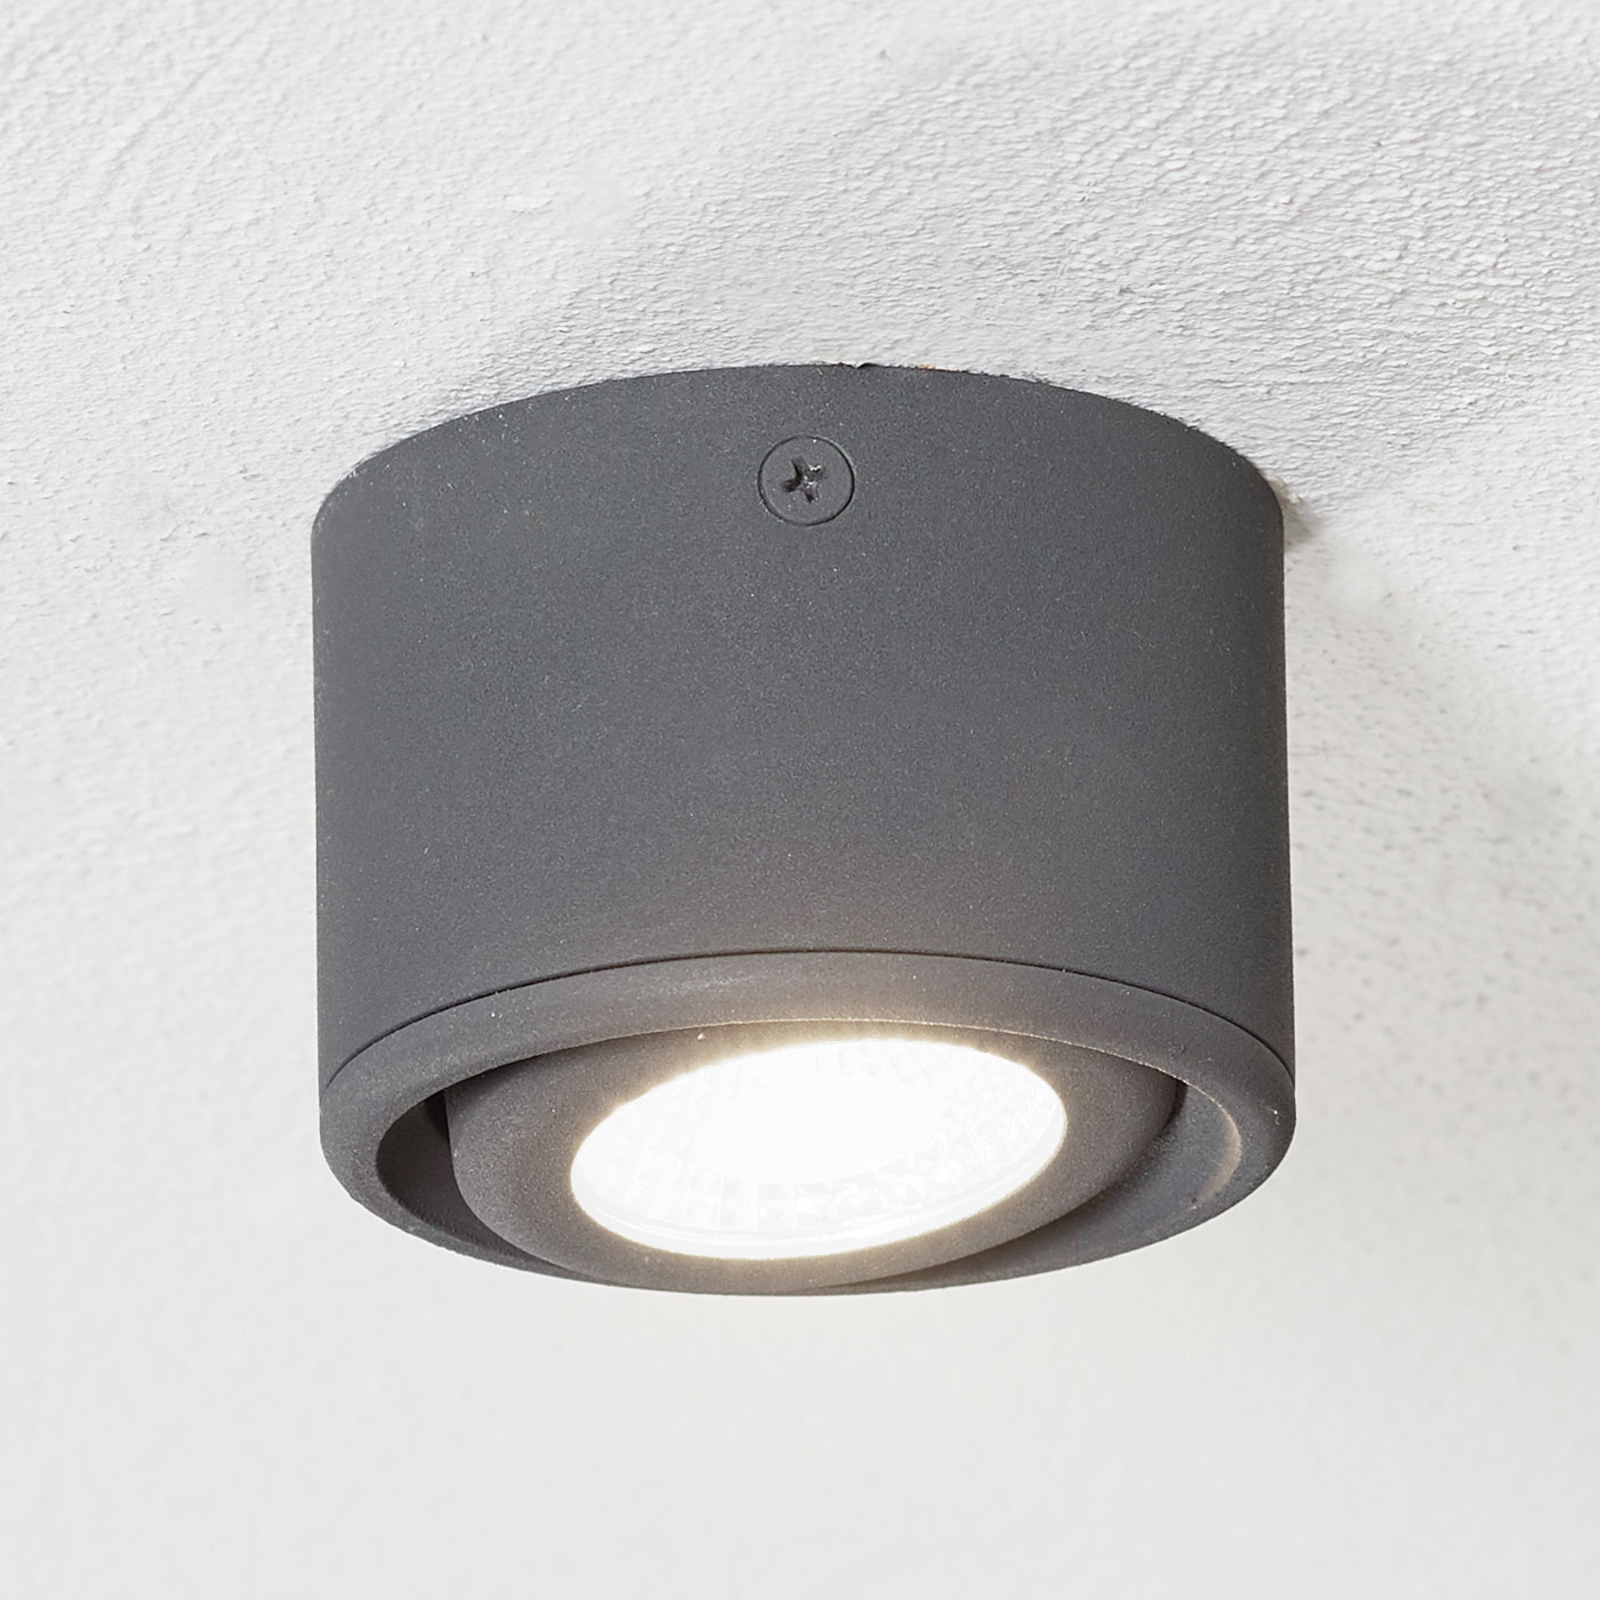 Kantelbare kop - LED downlight Anzio, antraciet